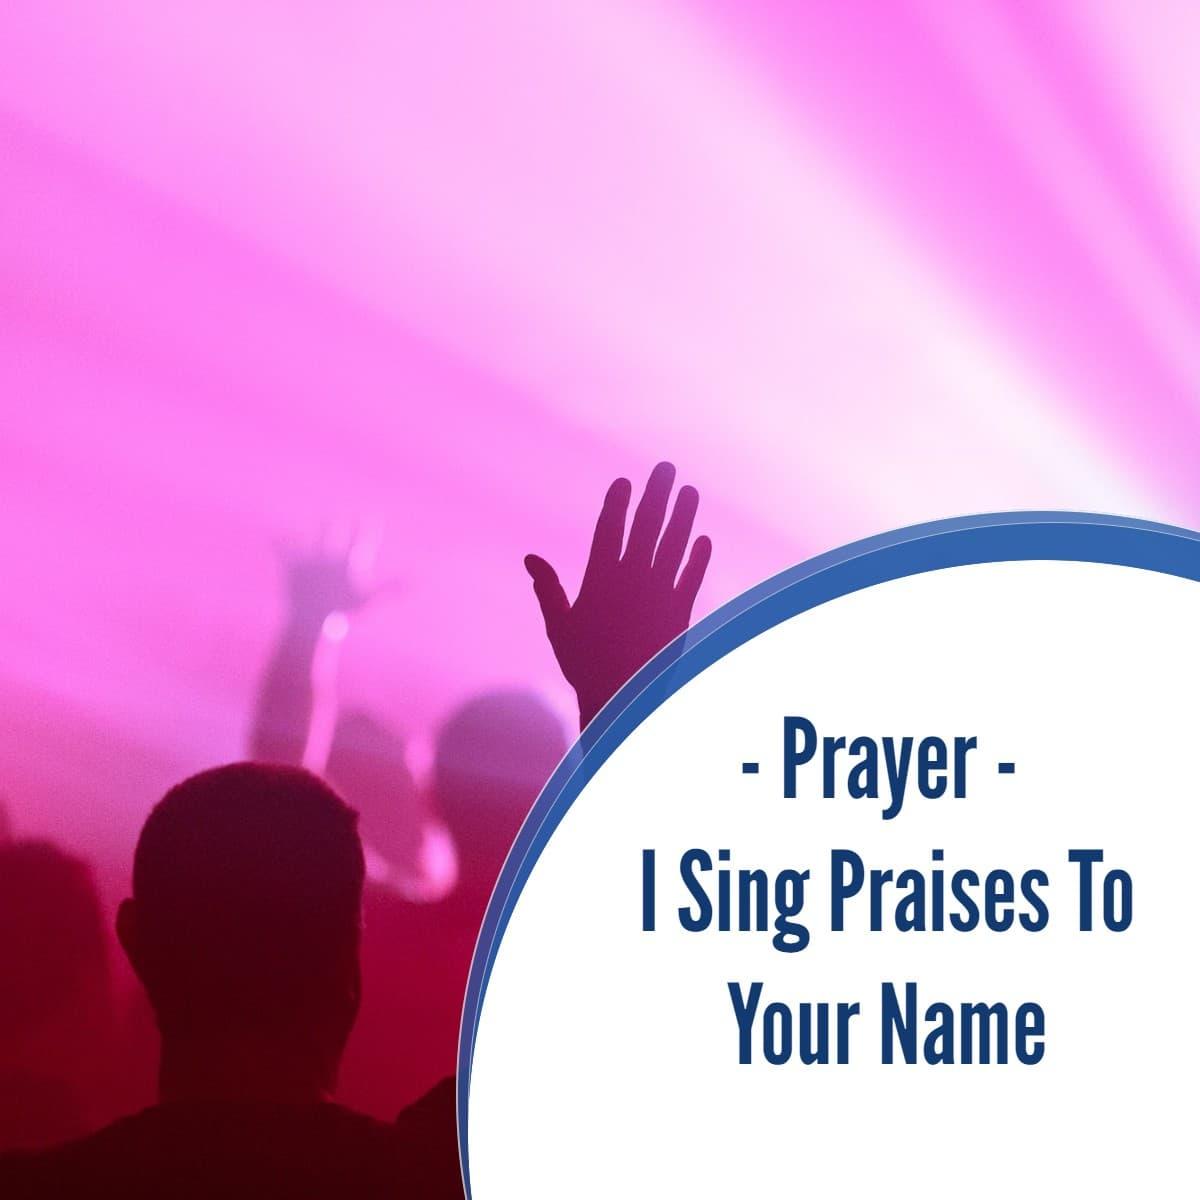 Prayer: I Sing Praises To Your Name